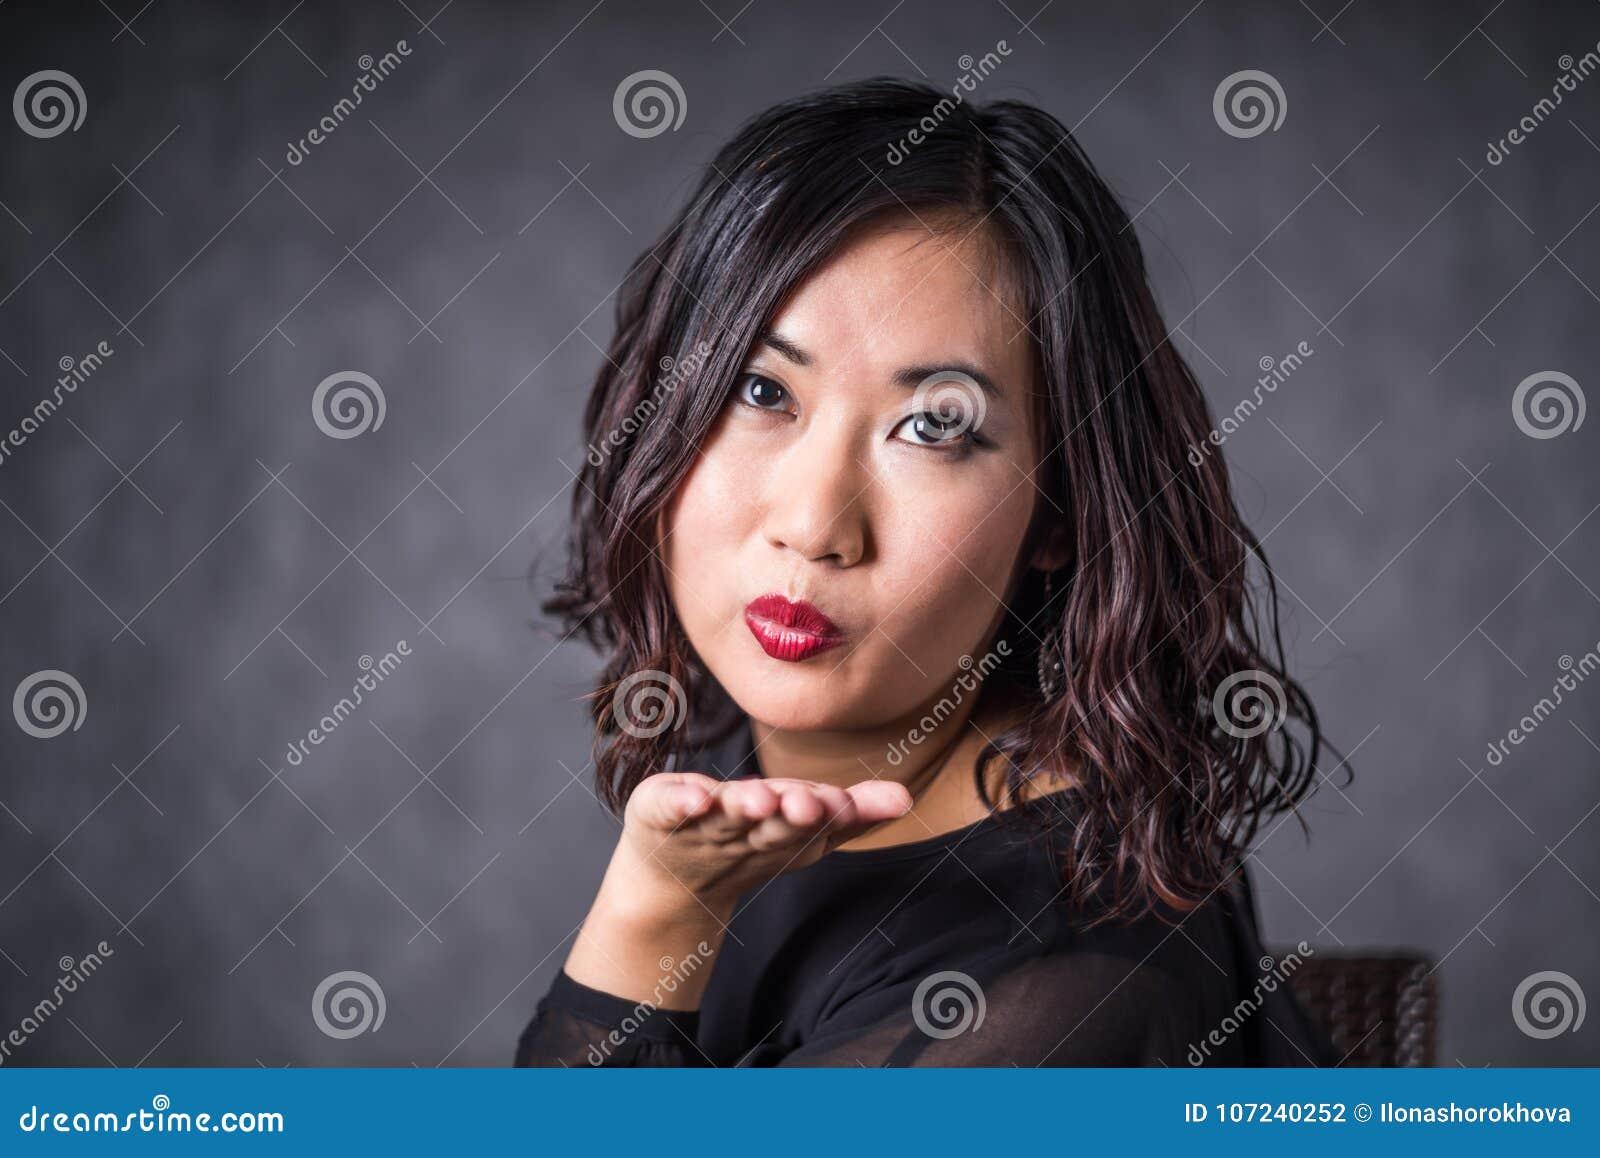 rencontre coquine idf annonce femme verone